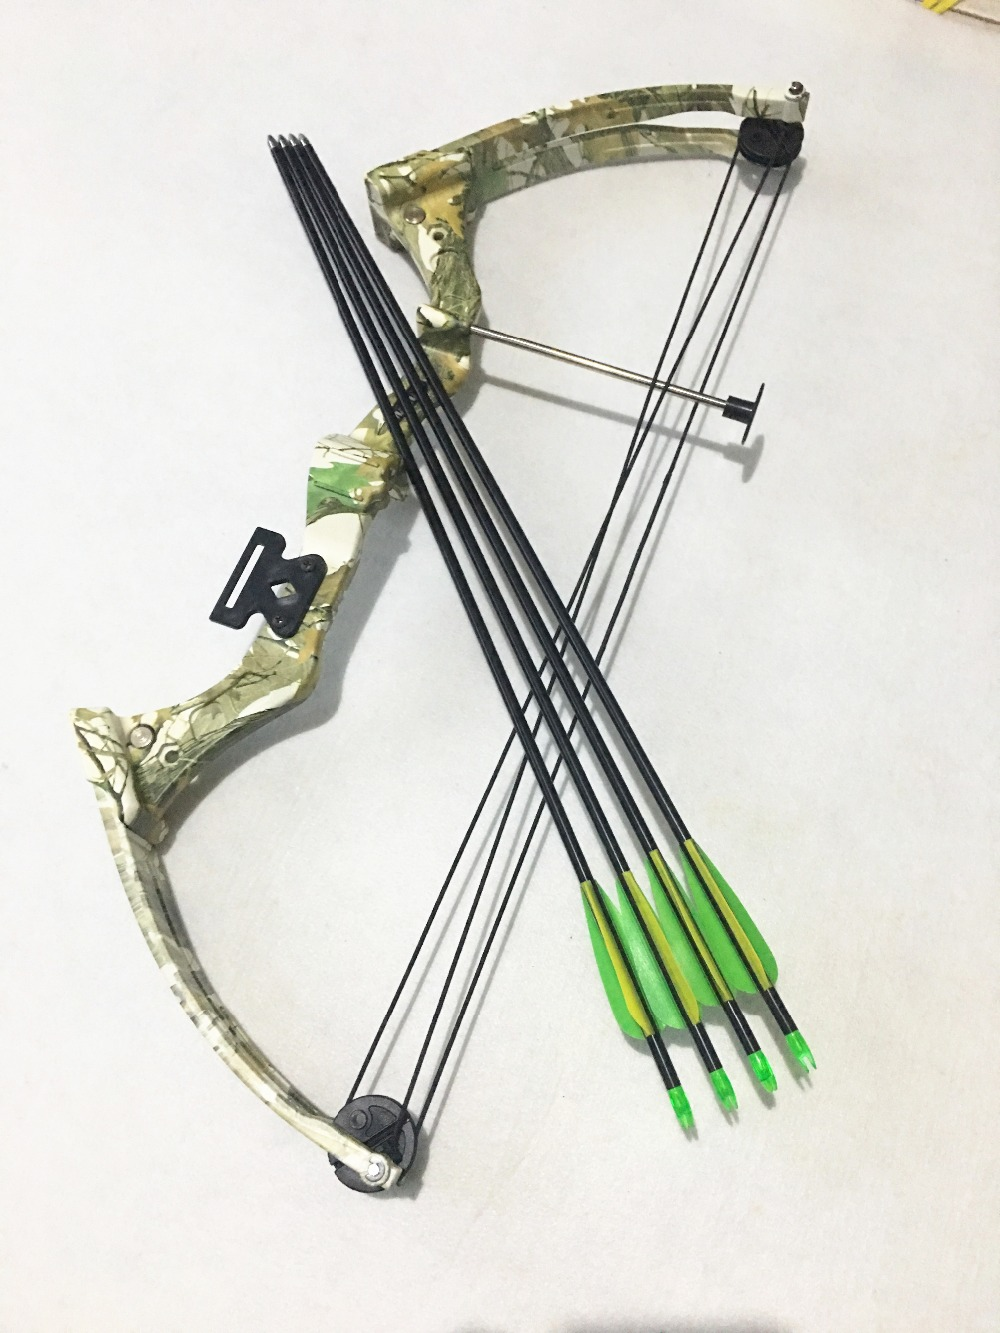 arco caça & conjunto seta polia peixe